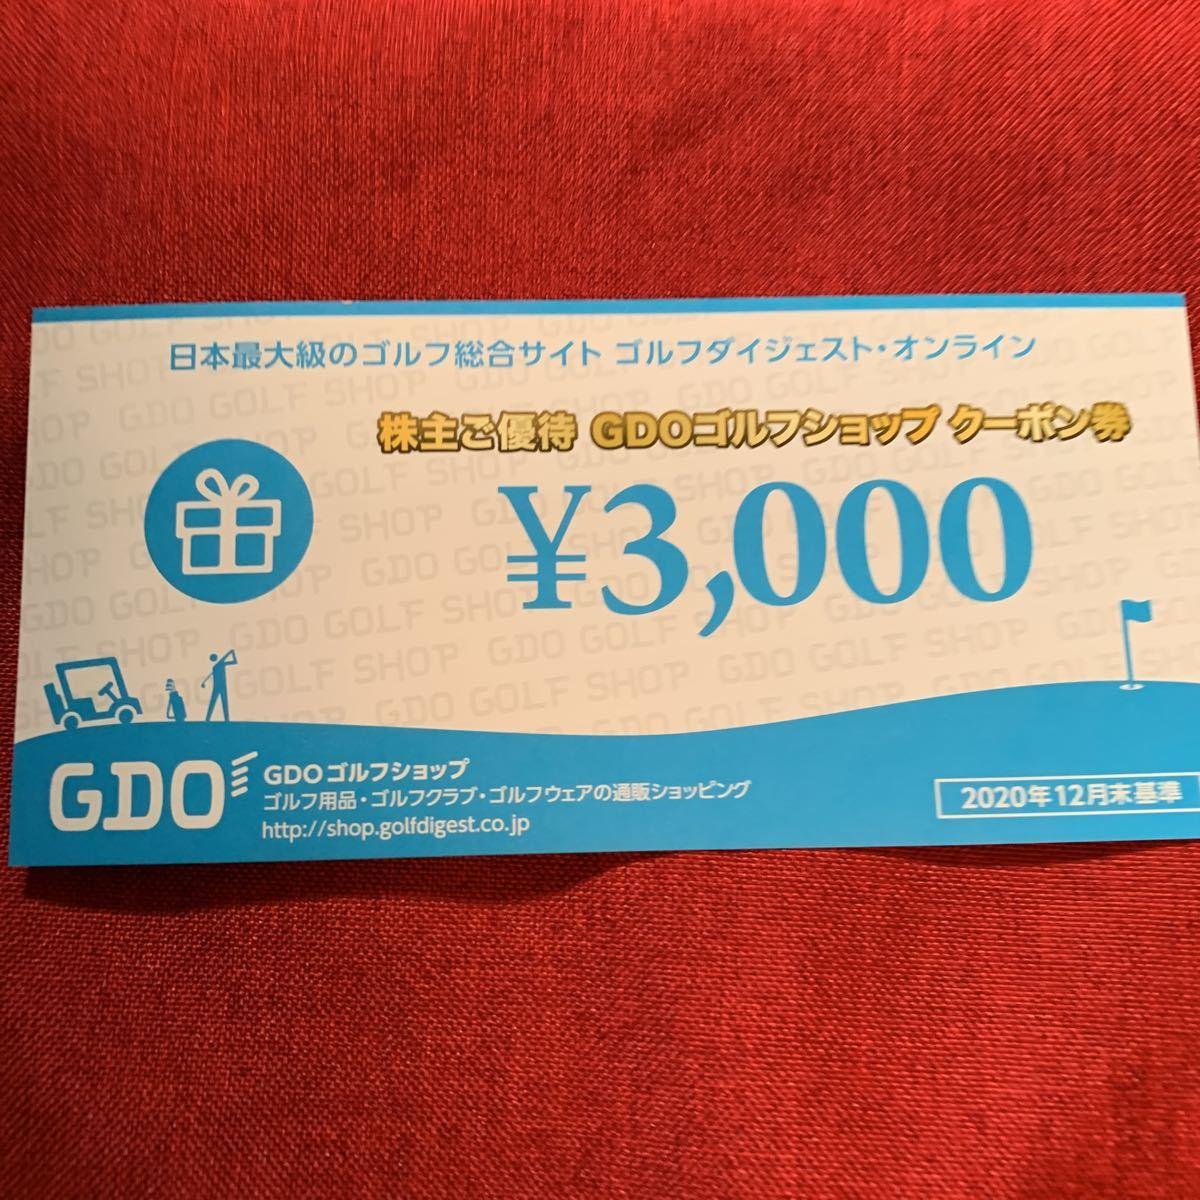 GDOゴルフダイジェストオンライン株主優待 GDOゴルフショップクーポン券3000円×1枚 20210630 番号通知可_画像1